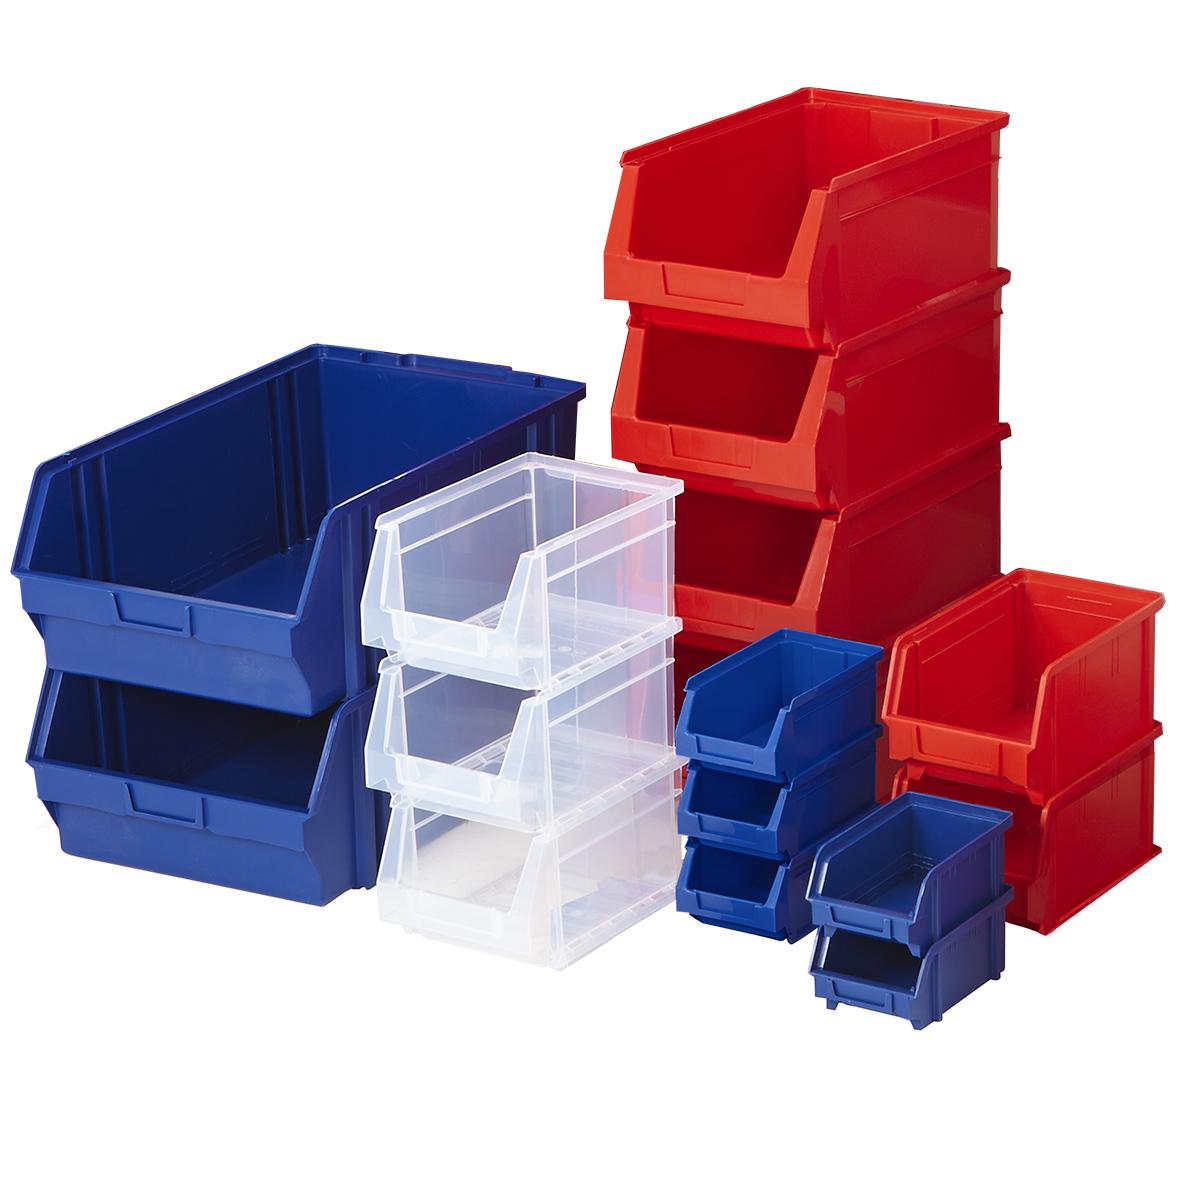 Plastic Parts Bins Shelf Stacking Storage Blue Garage Box